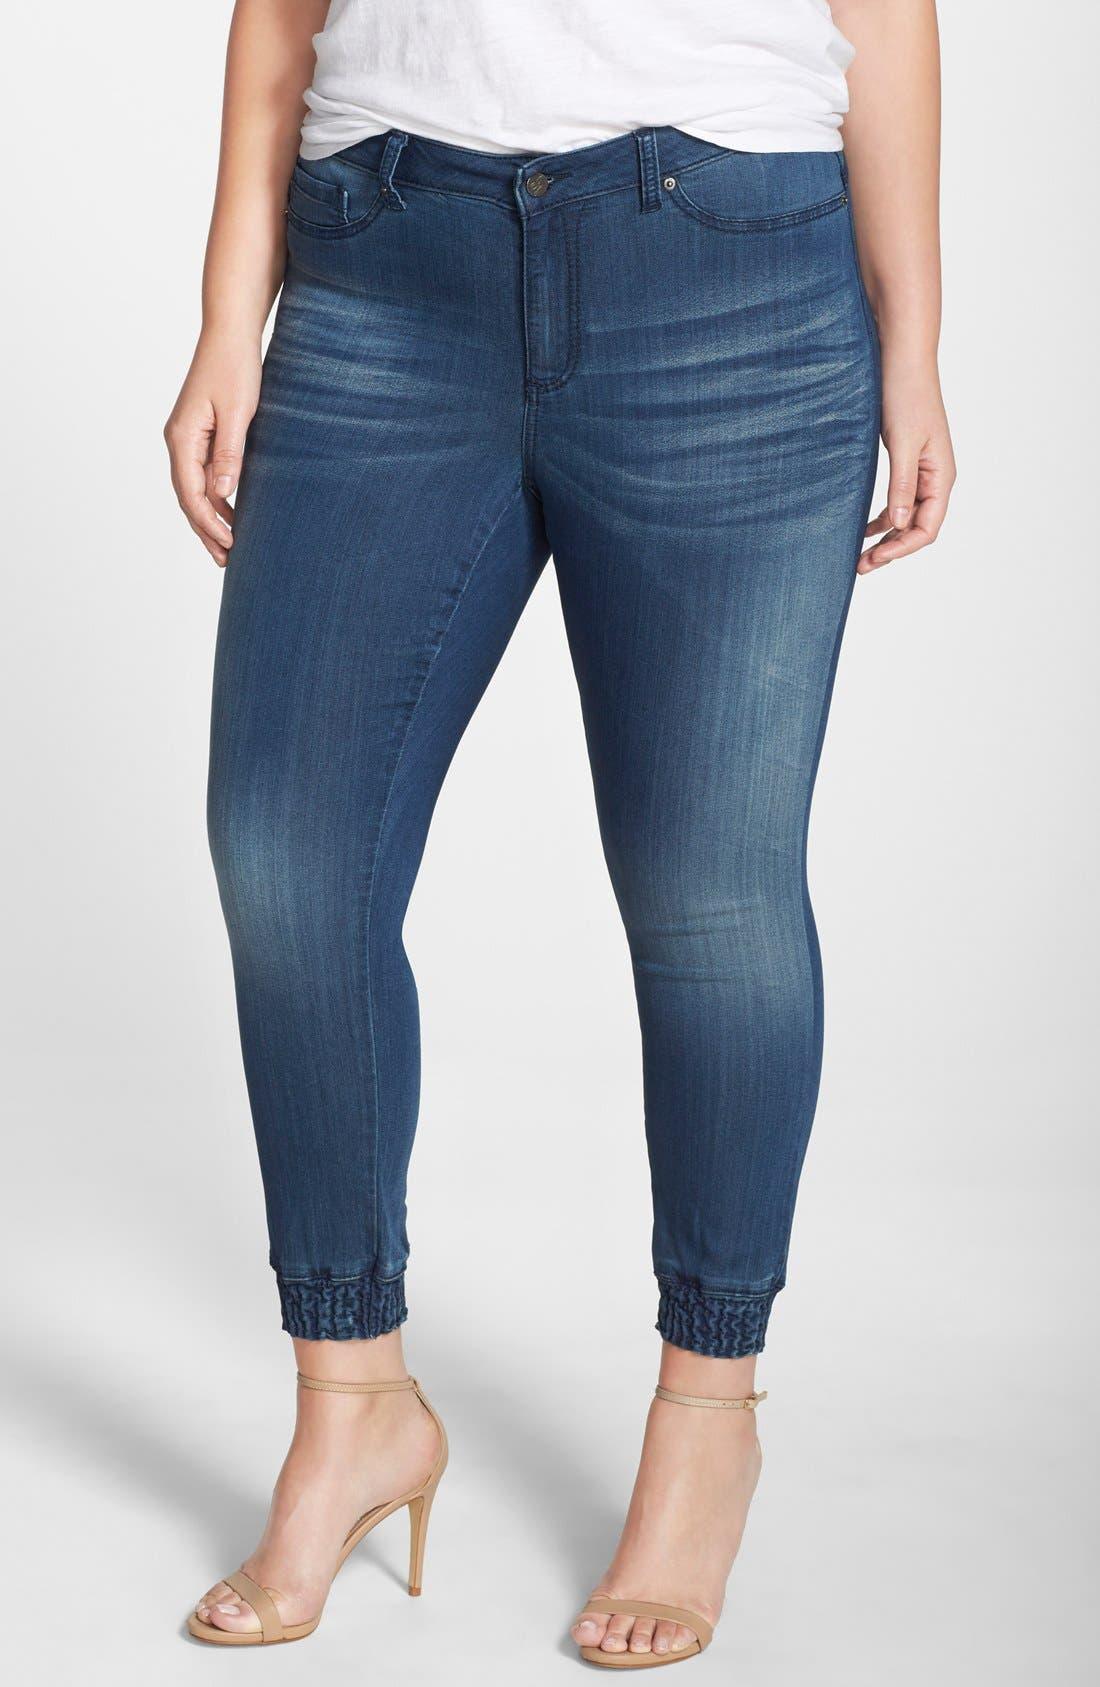 'Suzzie' Stretch Knit Denim Crop Jeans,                             Main thumbnail 1, color,                             DARK BLUE